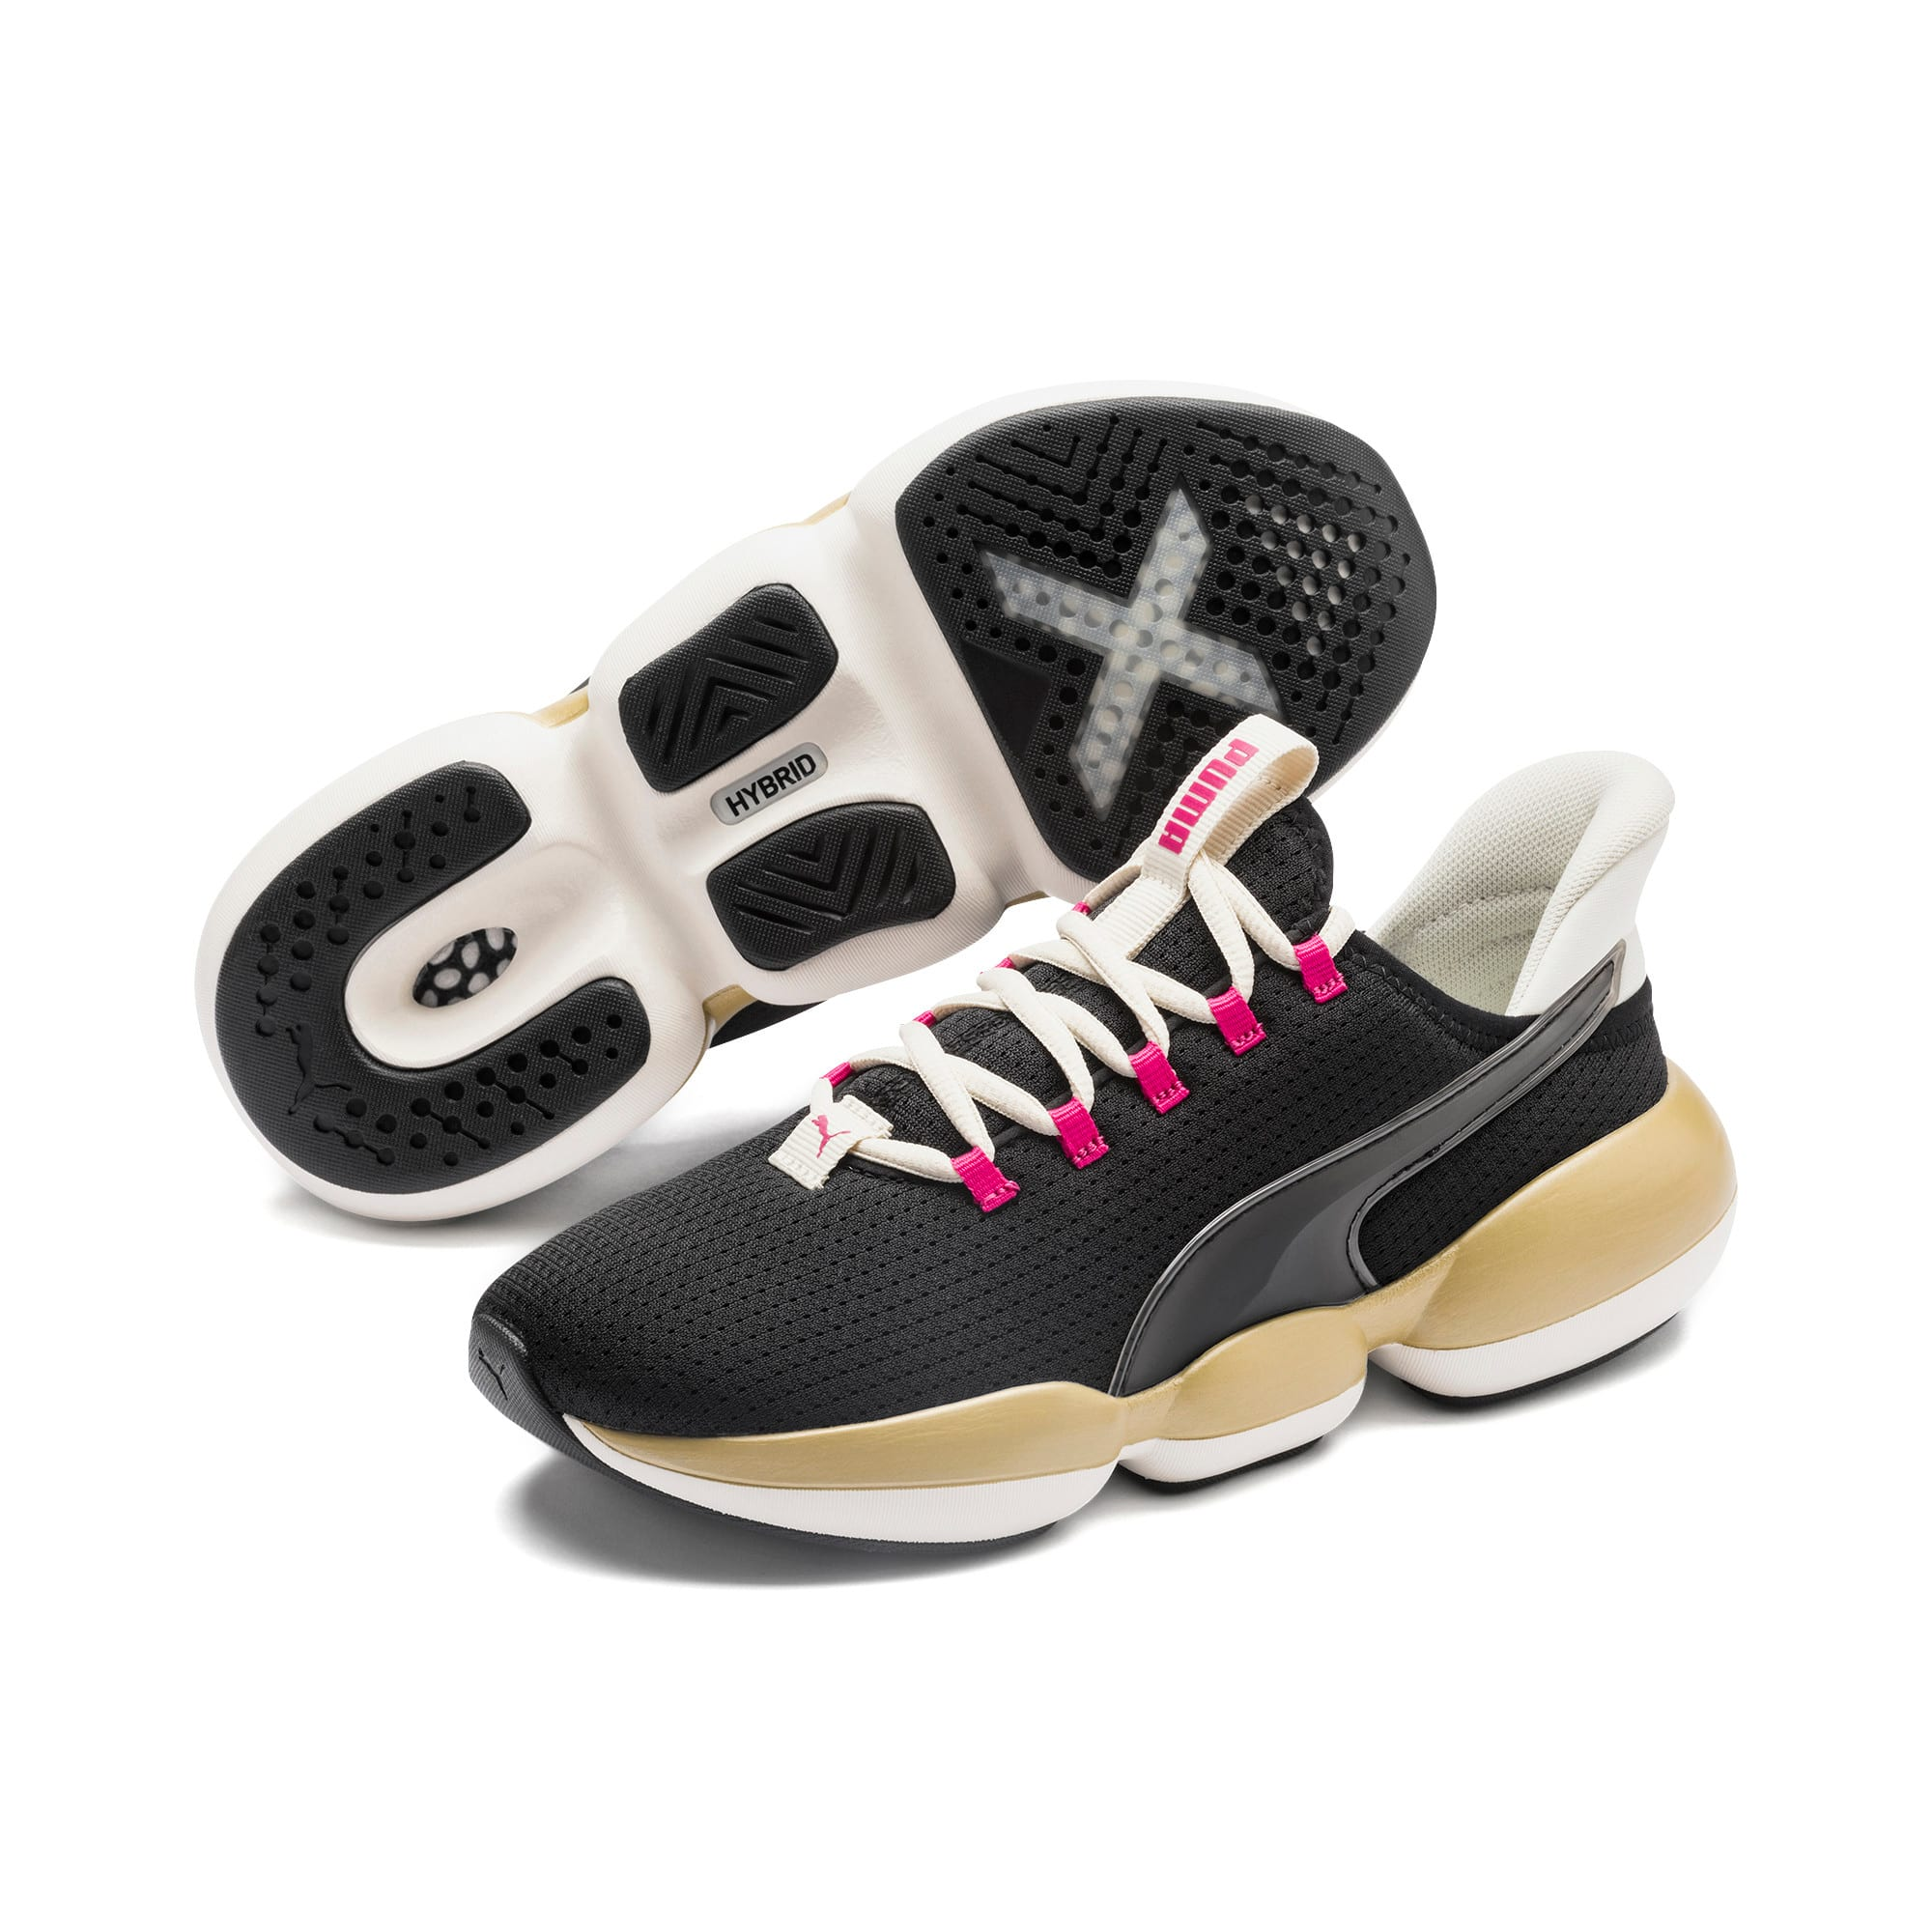 Thumbnail 2 of Mode XT Sweet Women's Training Shoes, Black- White-Purple, medium